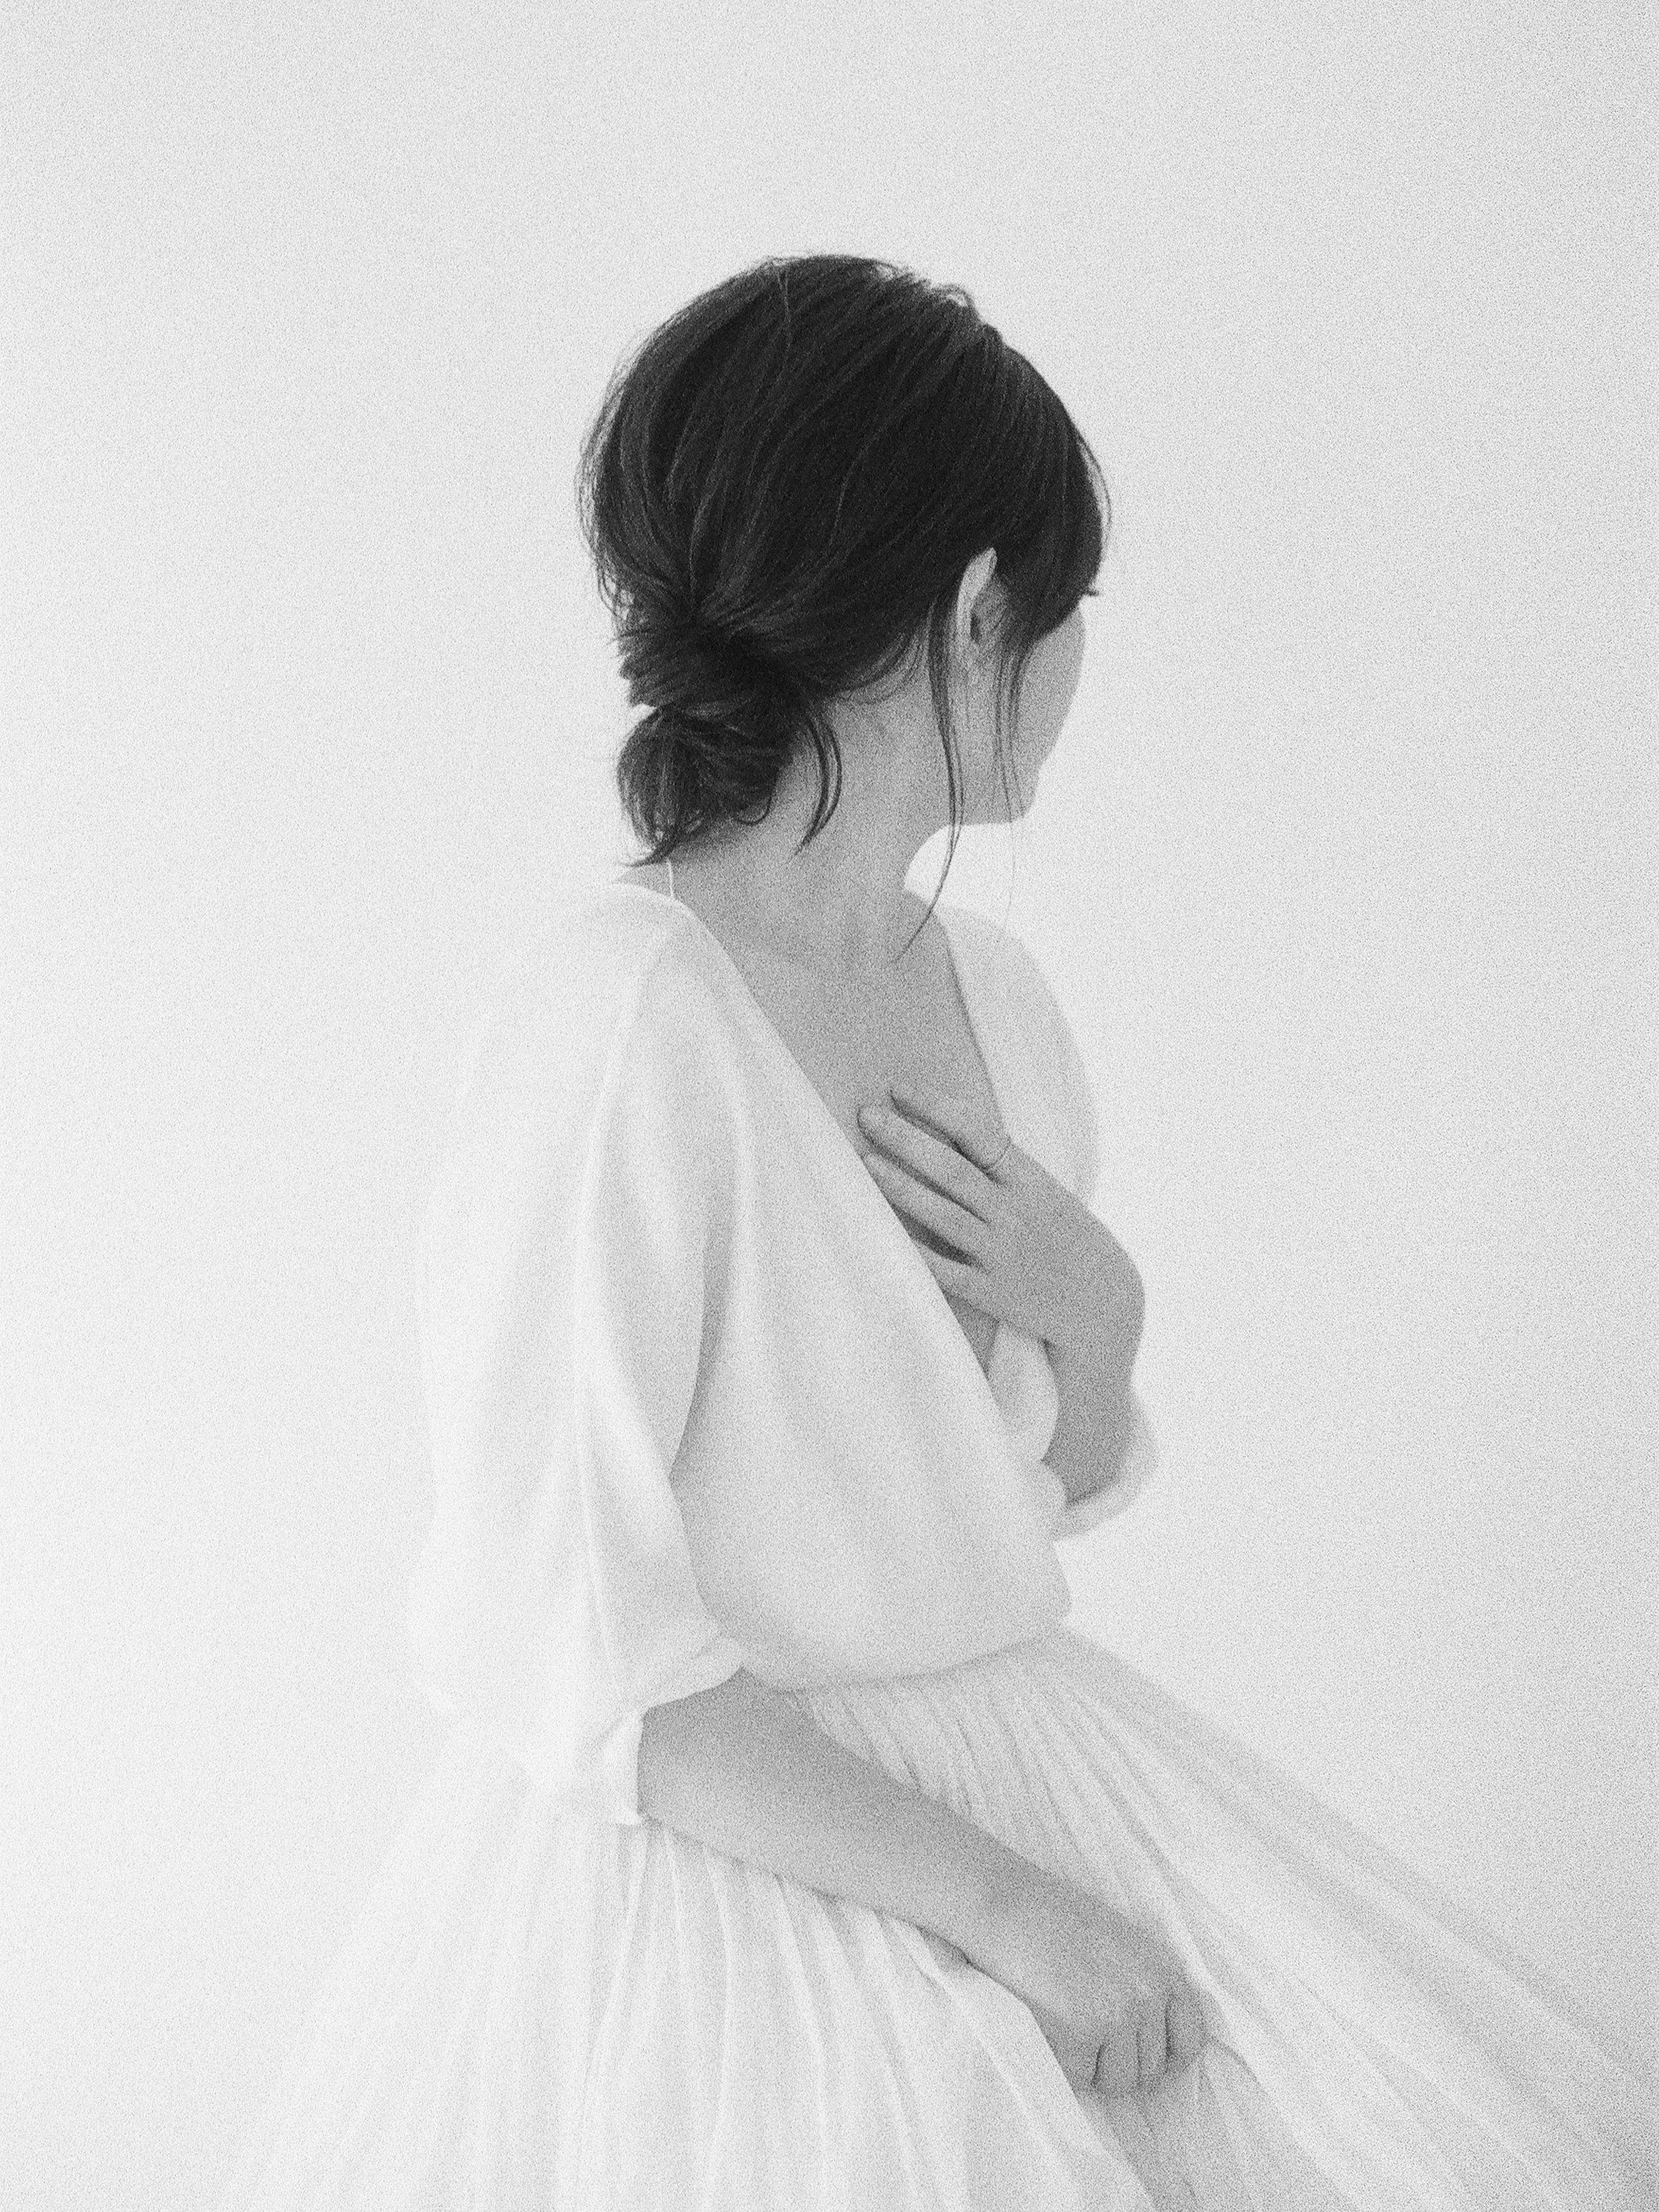 Joyce-164-Jen-Huang-000010480024.jpg